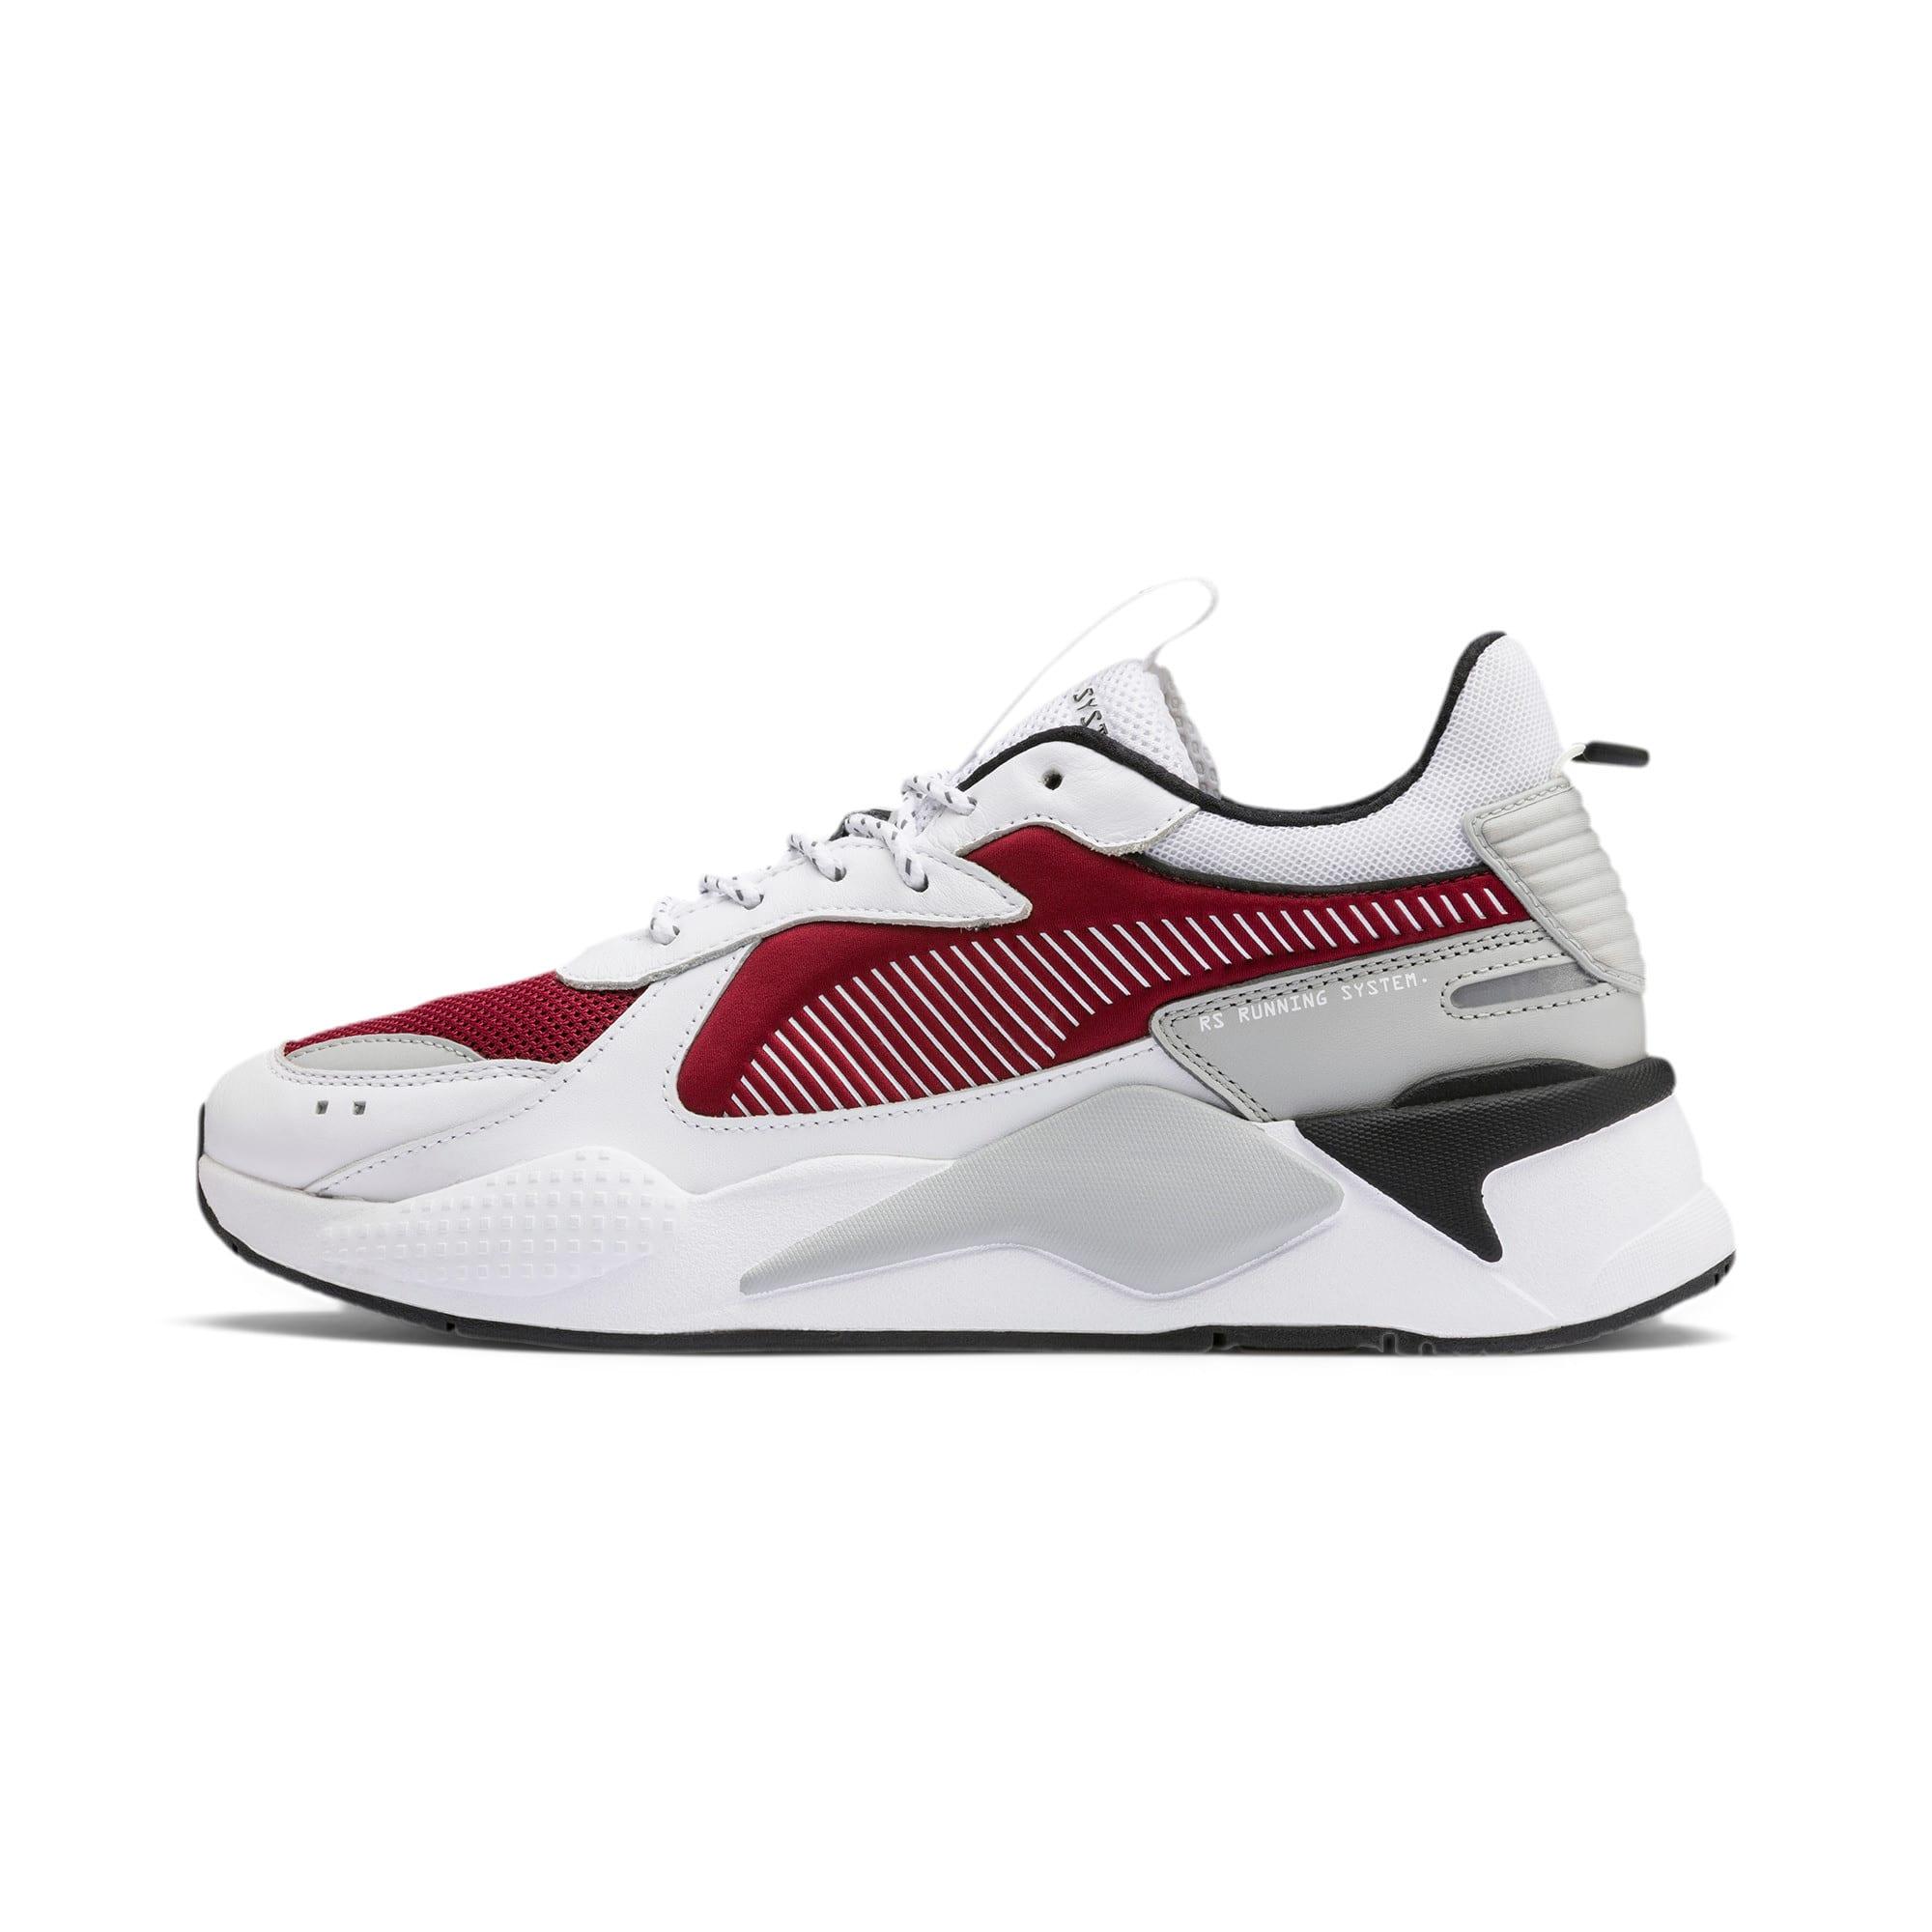 Thumbnail 1 of RS-X Core Sneakers, Puma White-Rhubarb, medium